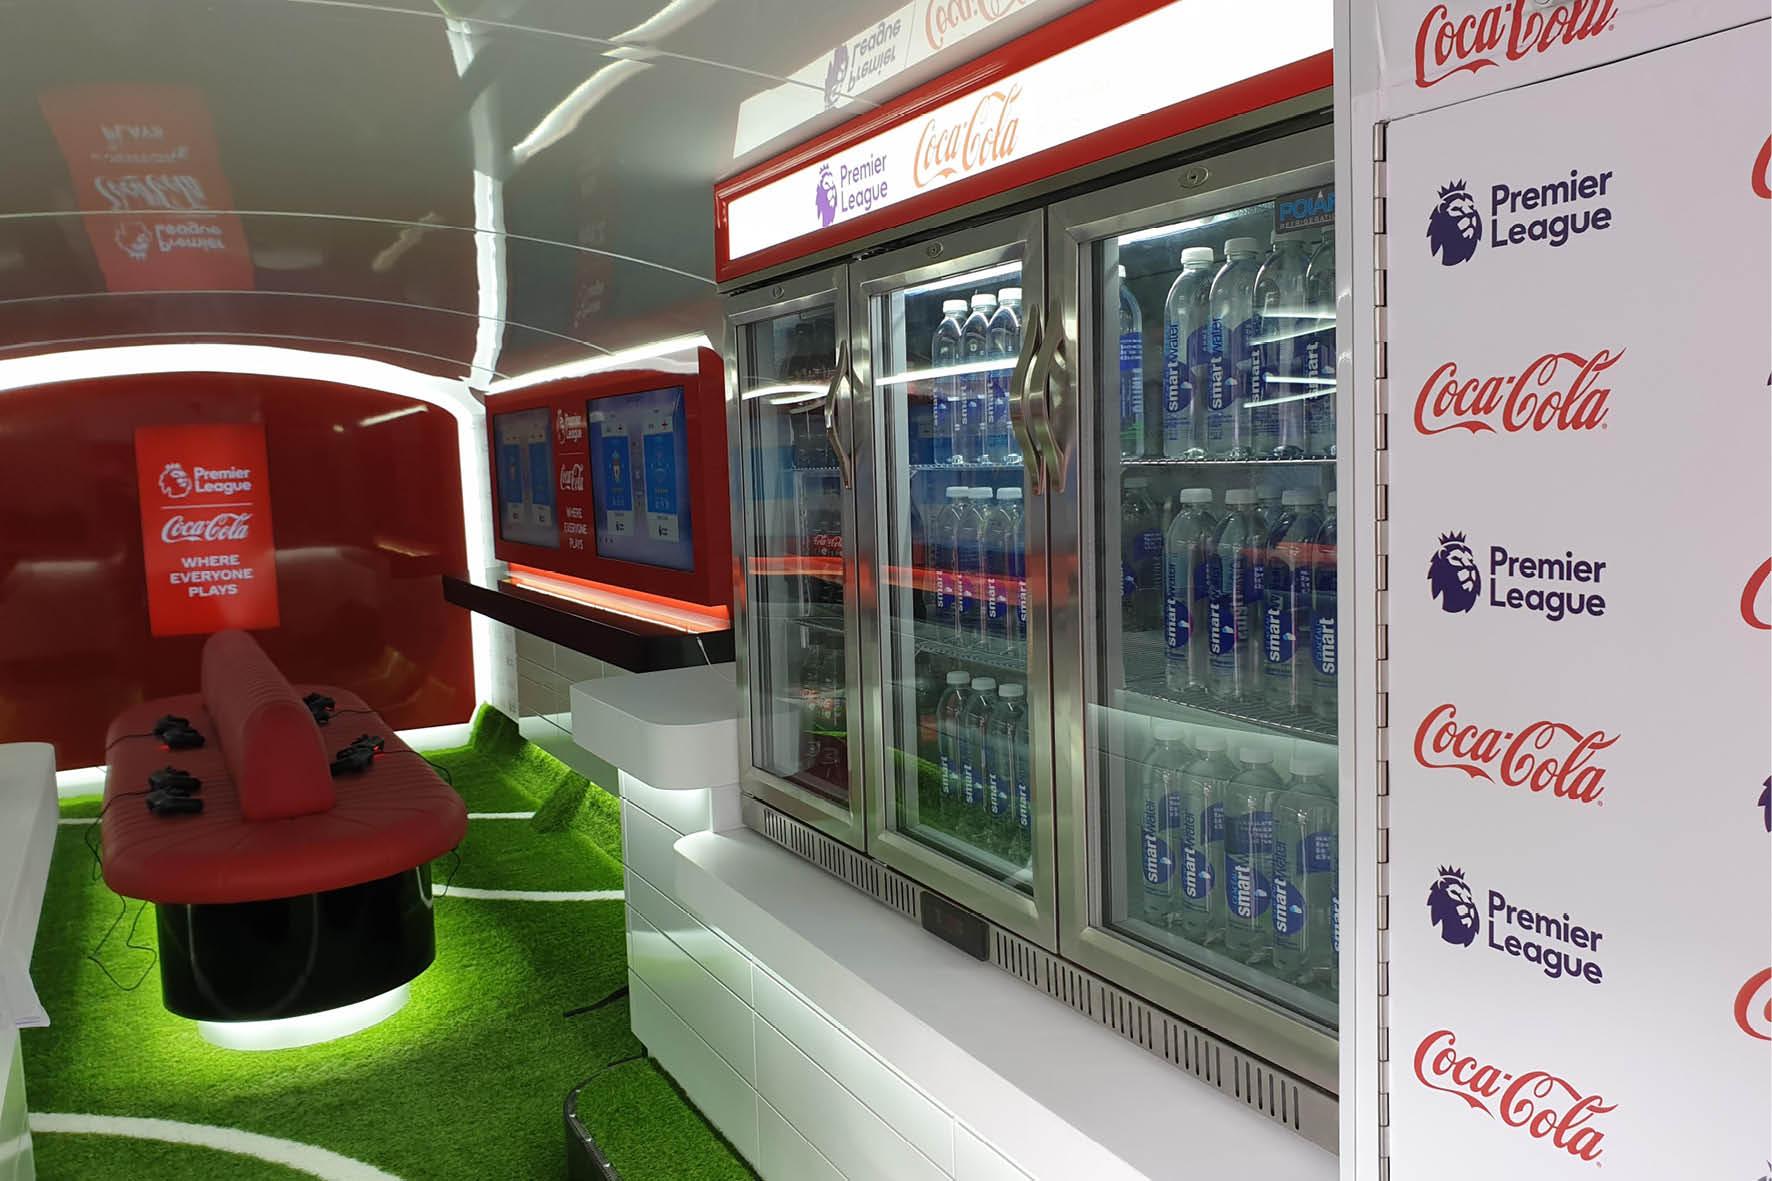 bus_business_2019_coca_cola_11.jpg